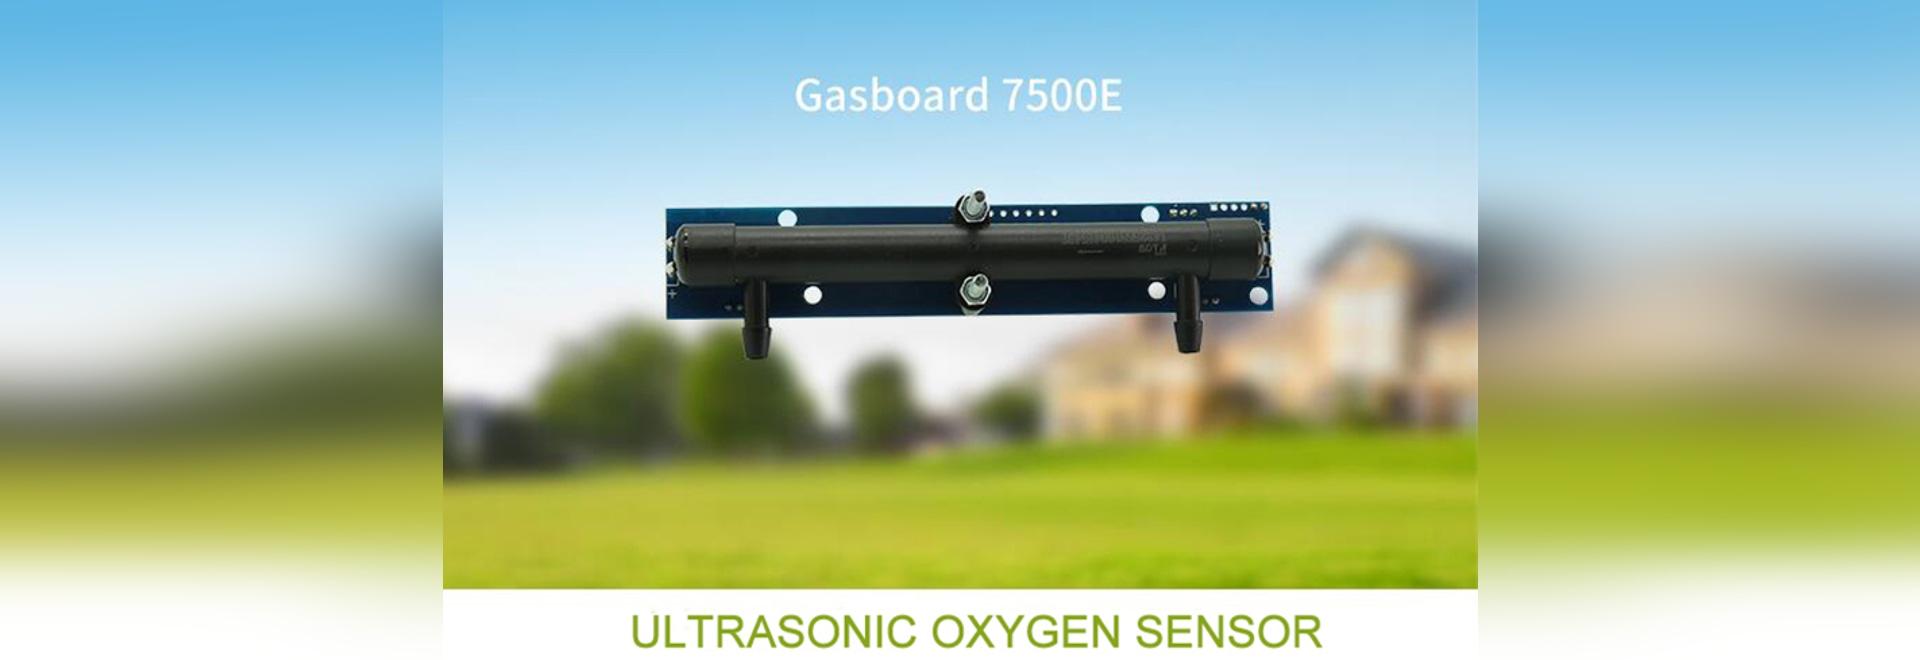 Ultrasonic Oxygen Sensor Gasboard7500E for  Ventilator Application Solution